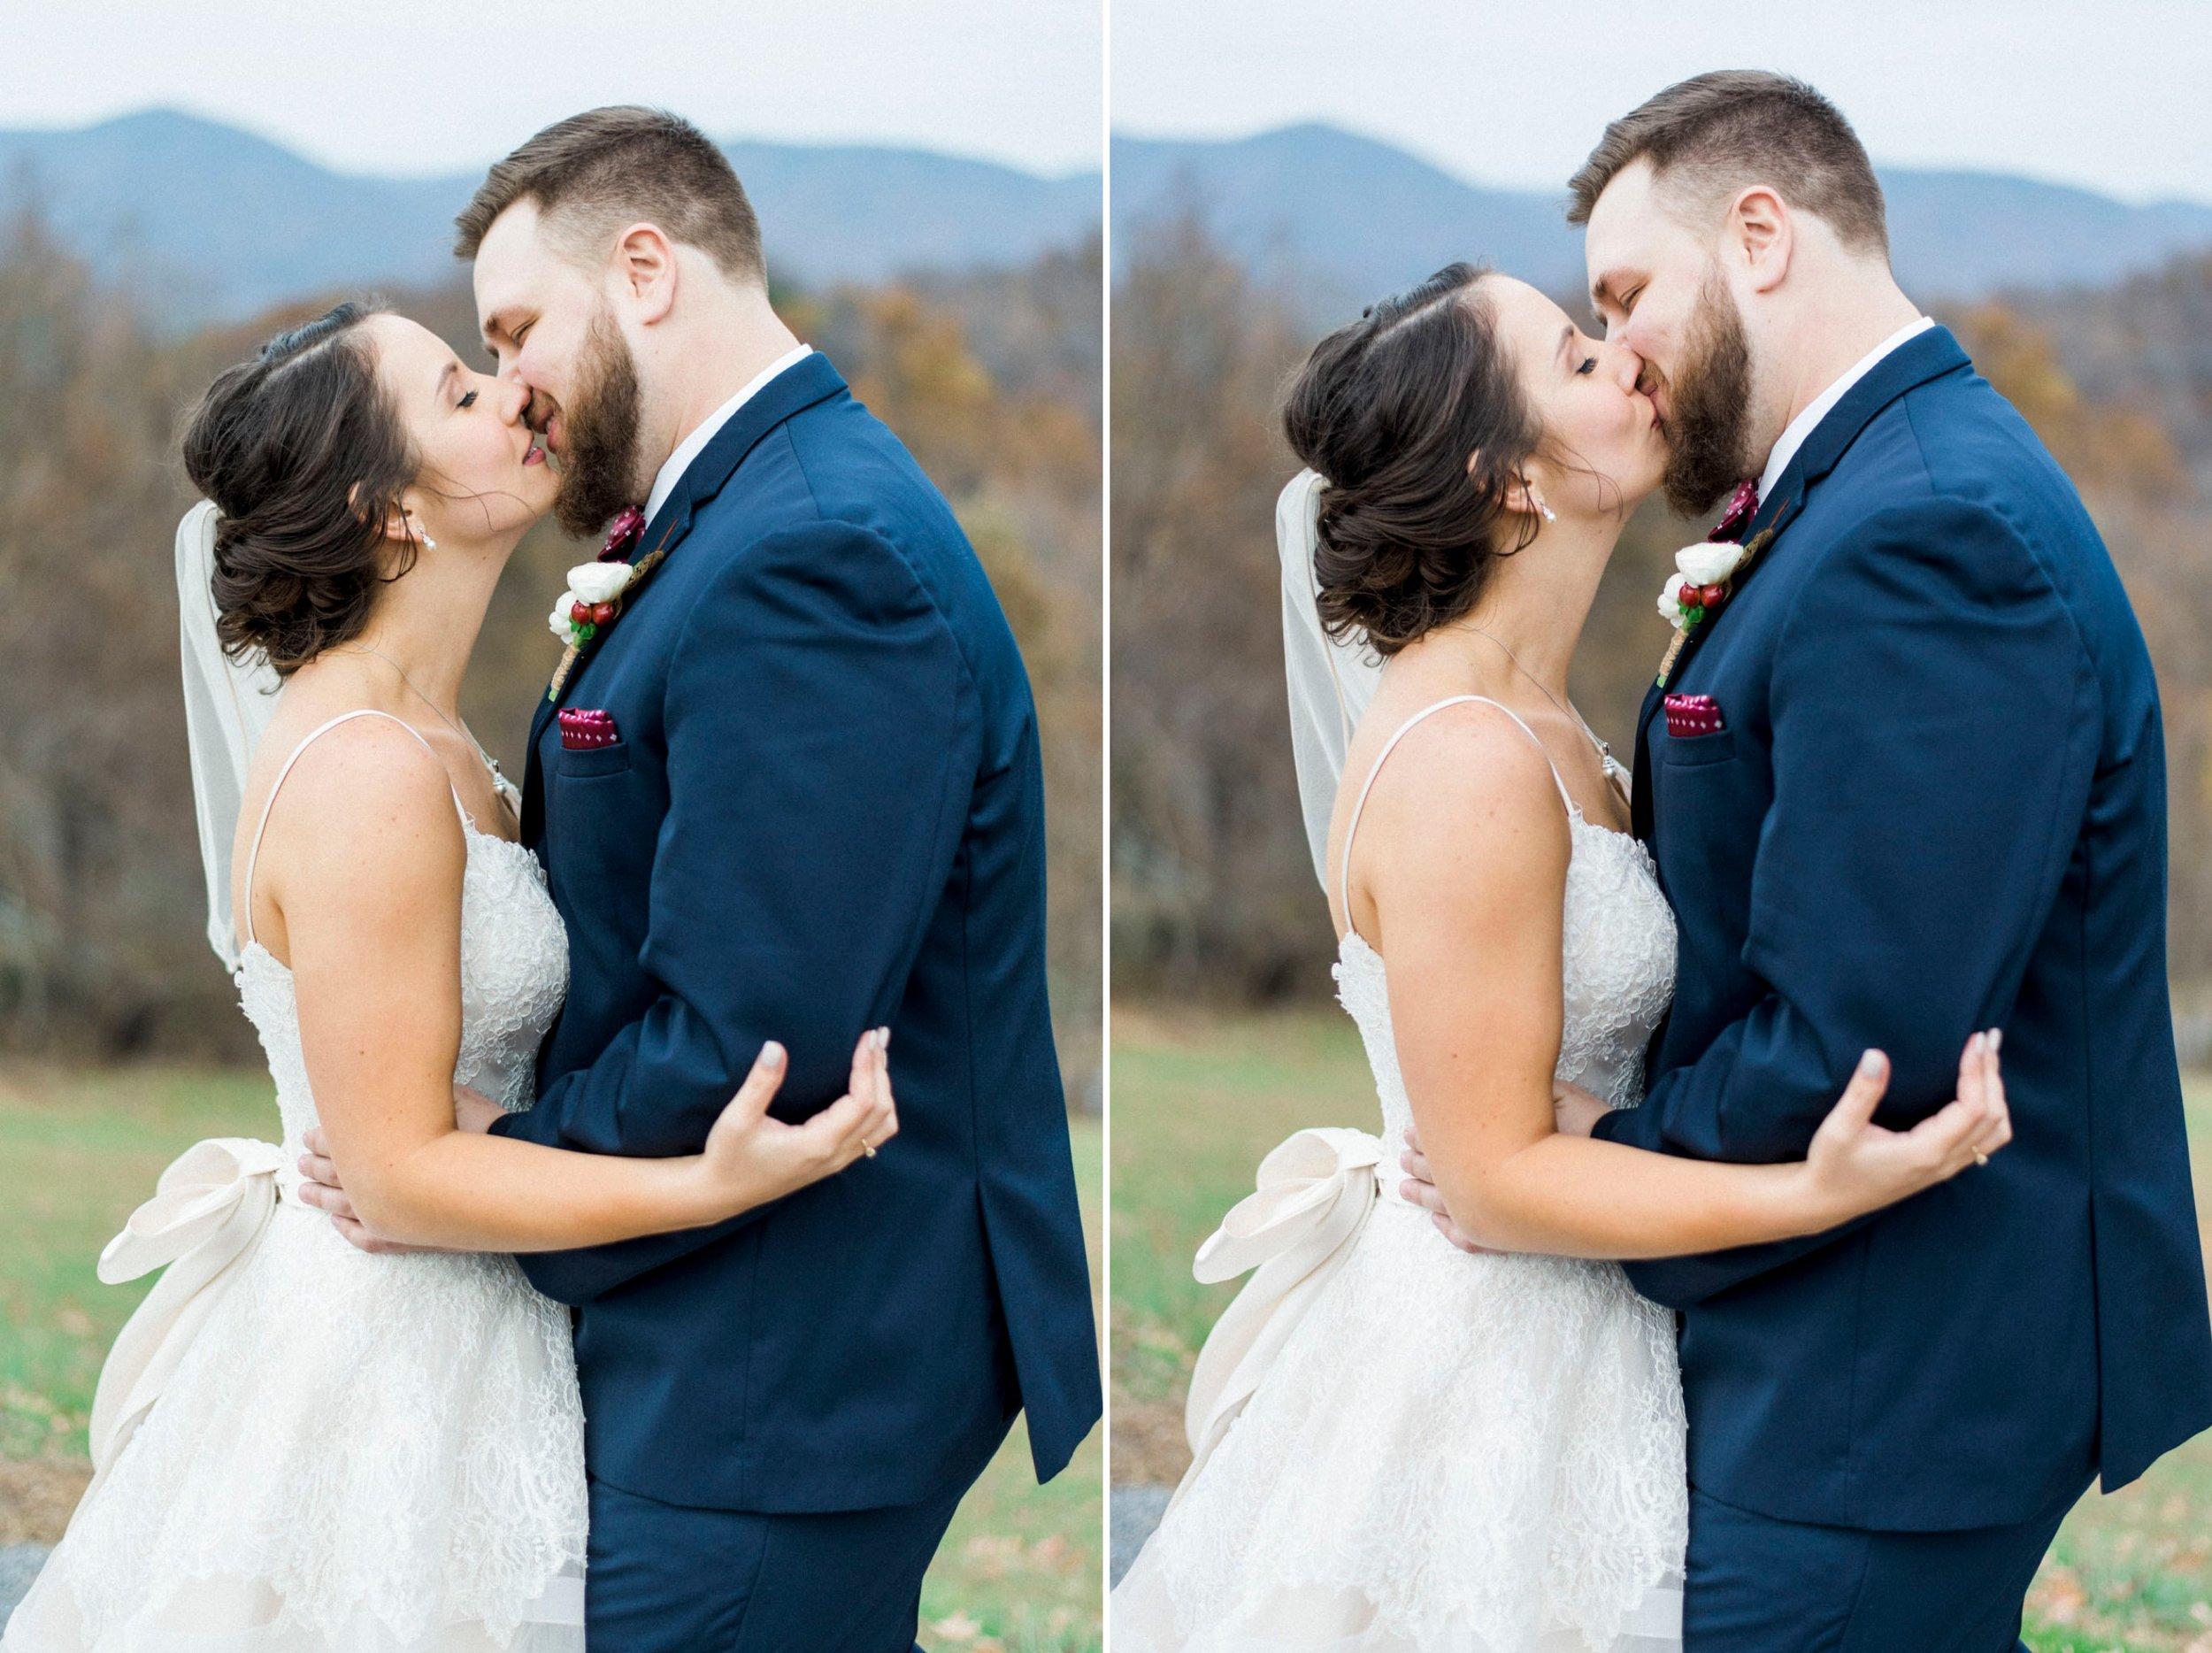 IrvineEstate_LexingtonVA_Wedding_FallWedding_VirginiaWeddingPhotographer 85.jpg